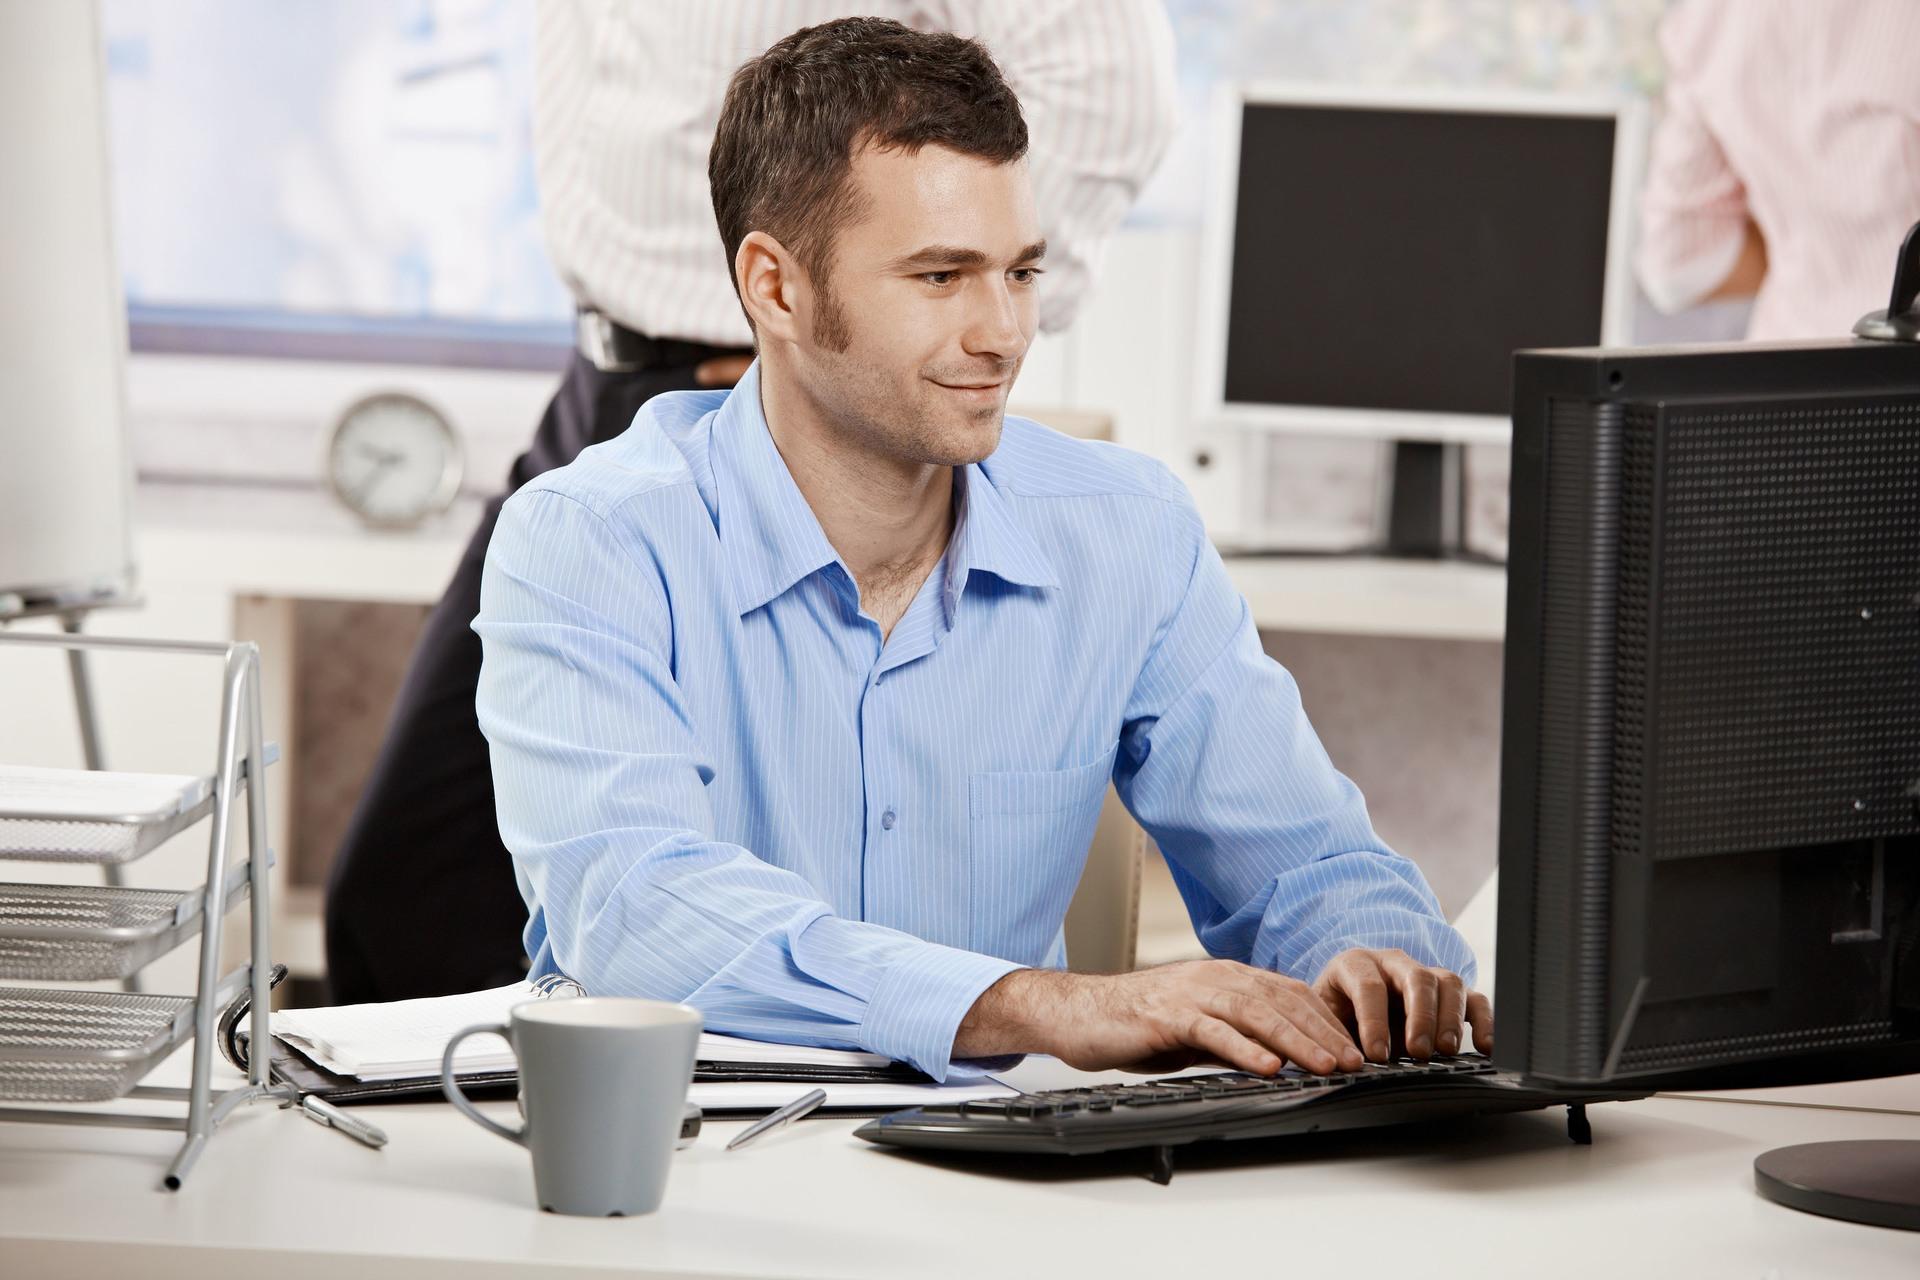 Фото человека на работе за компьютером